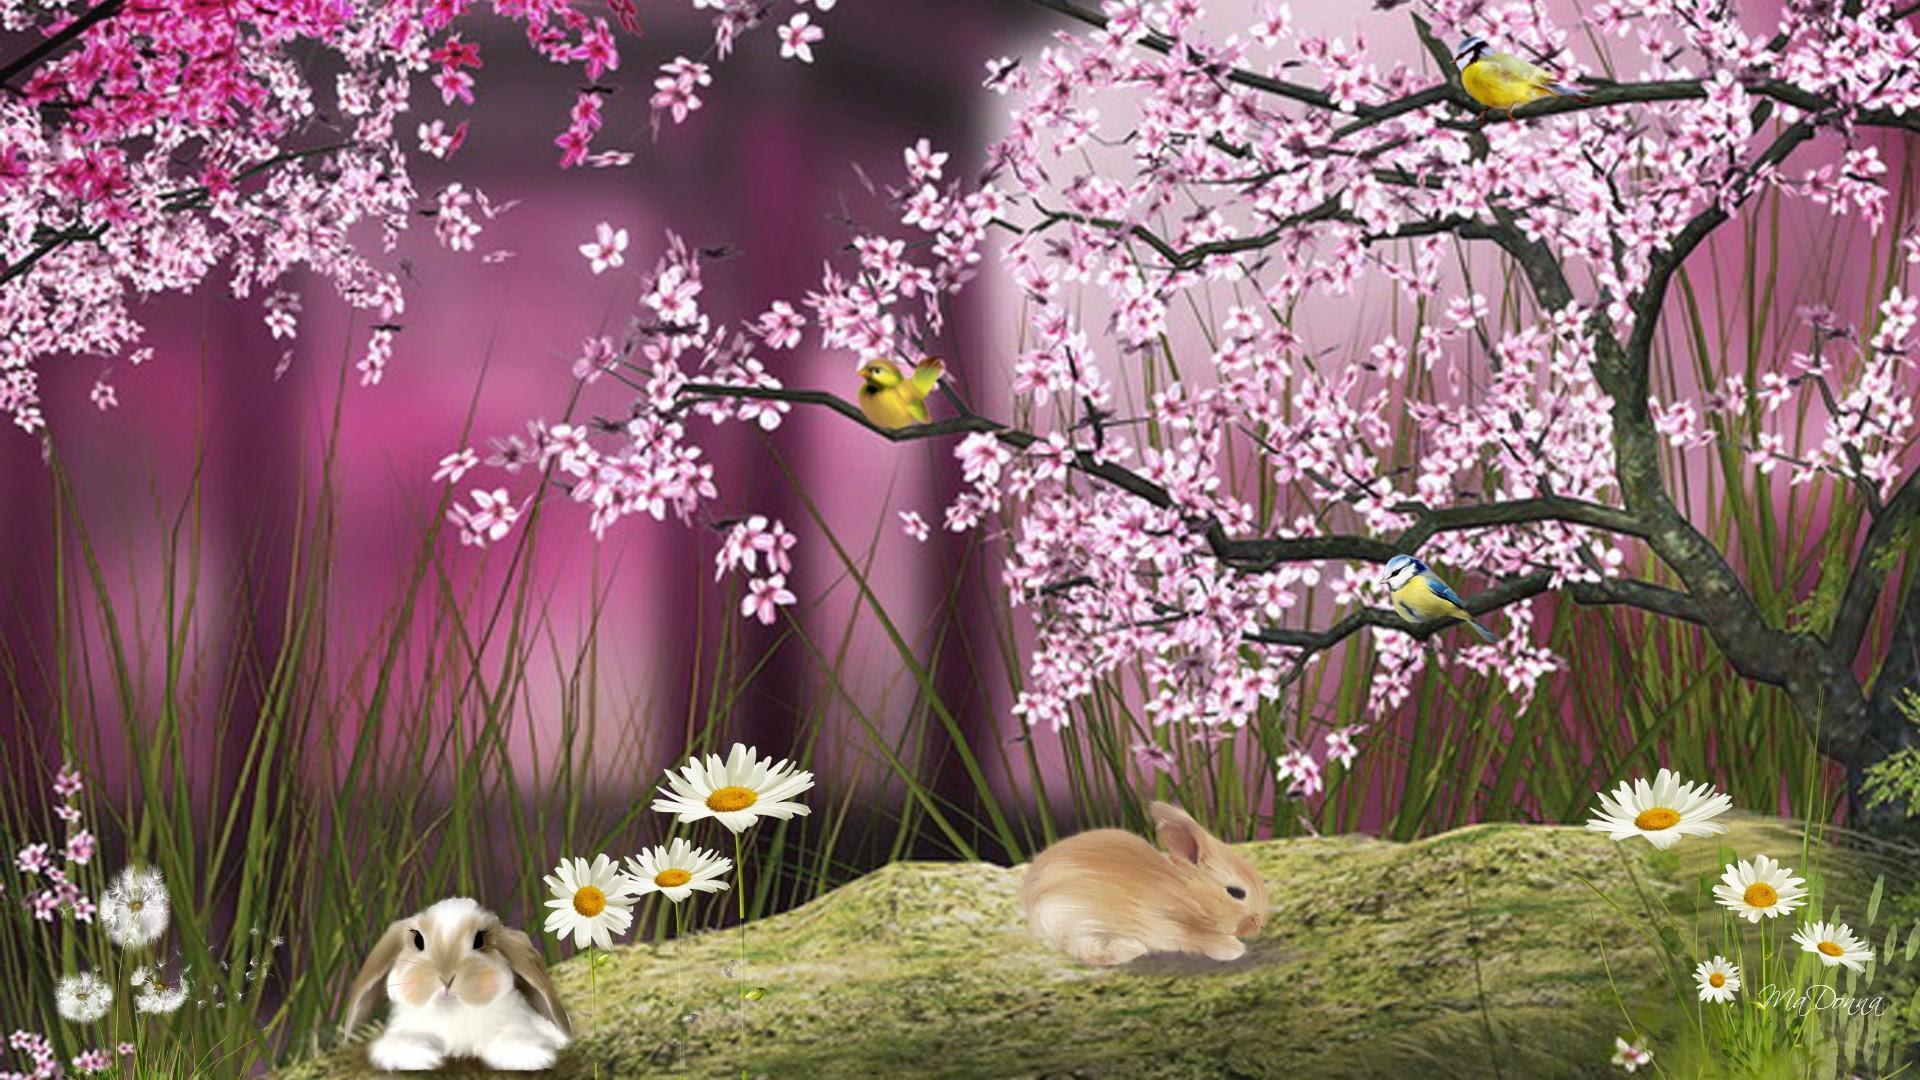 Wallpaper 3d Bunga Sakura Gambar Dp Bbm